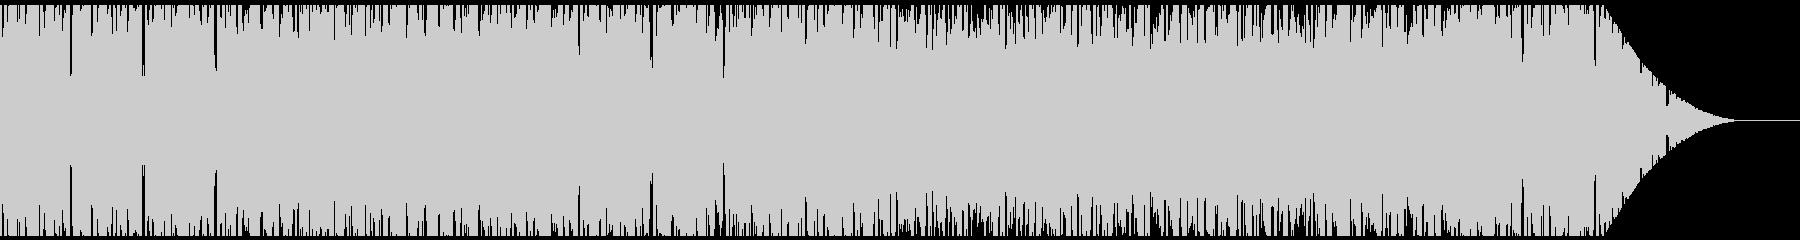 FPSゲームの待機中の画面BGMに合う曲の未再生の波形